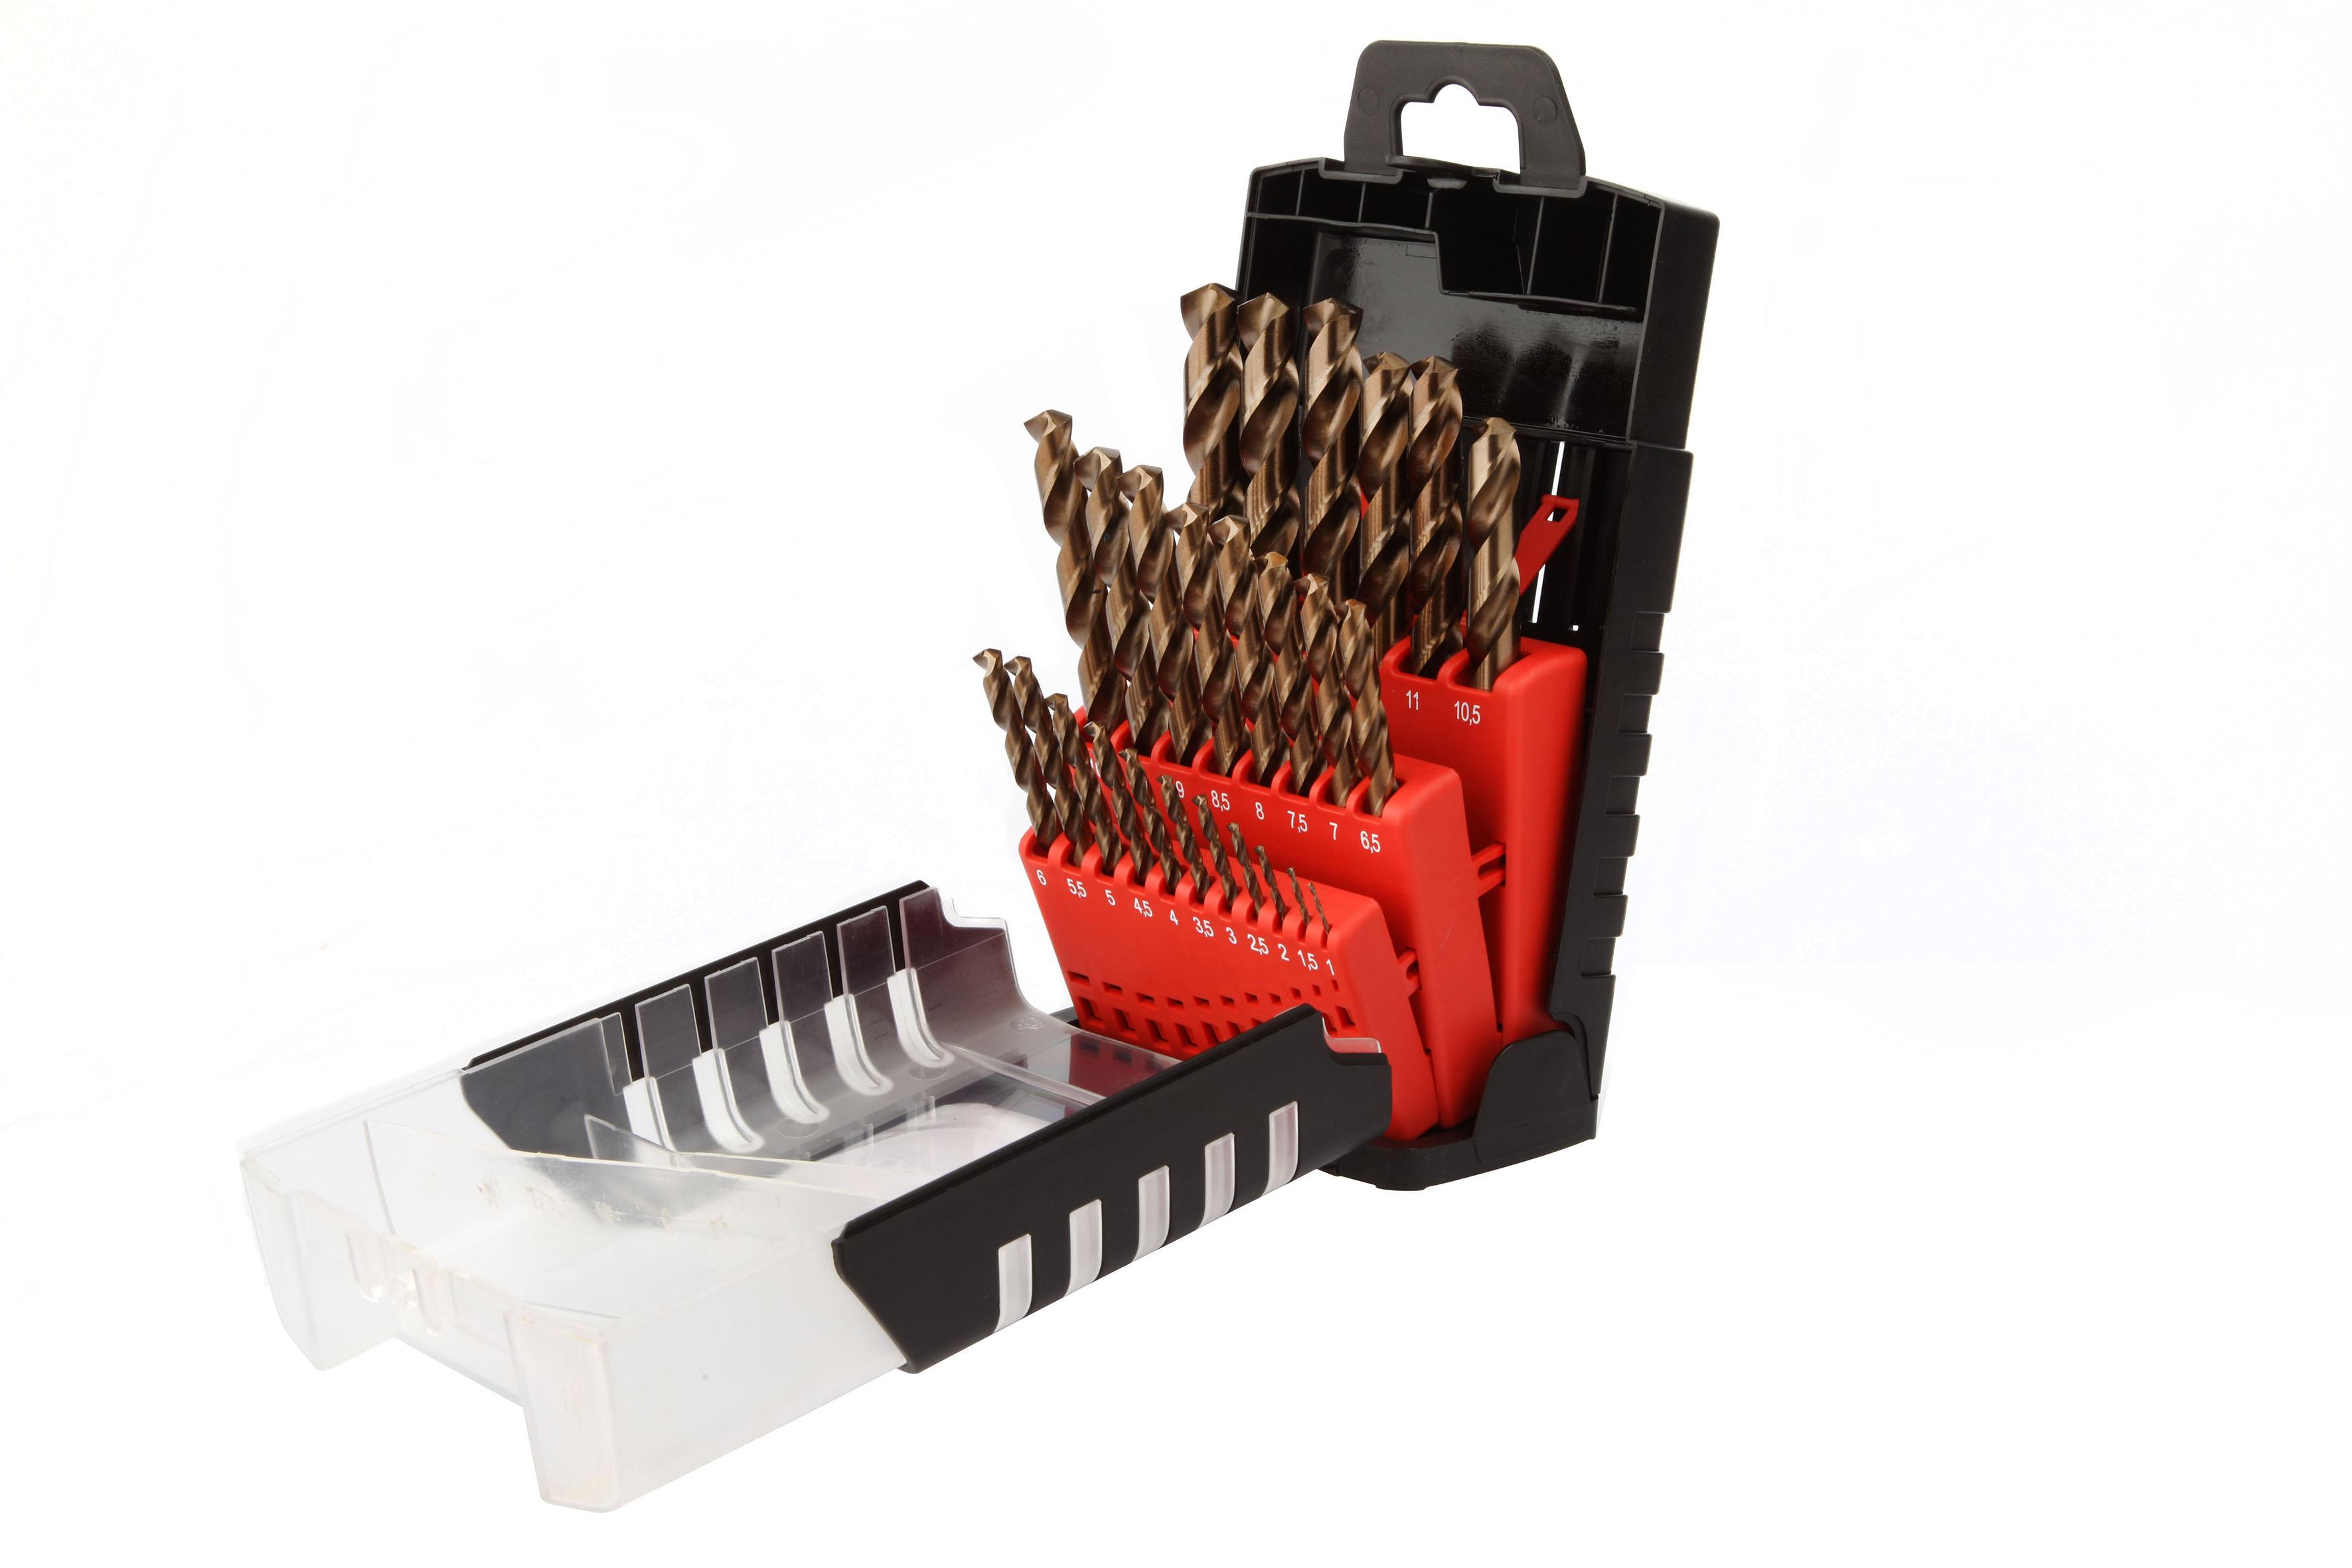 Drilling Cobalt 5% Set 25 HSS 5% Cobalt drill bit 135° split point sizes Ø1 to 13mm by 0,5mm - 707D.jpg